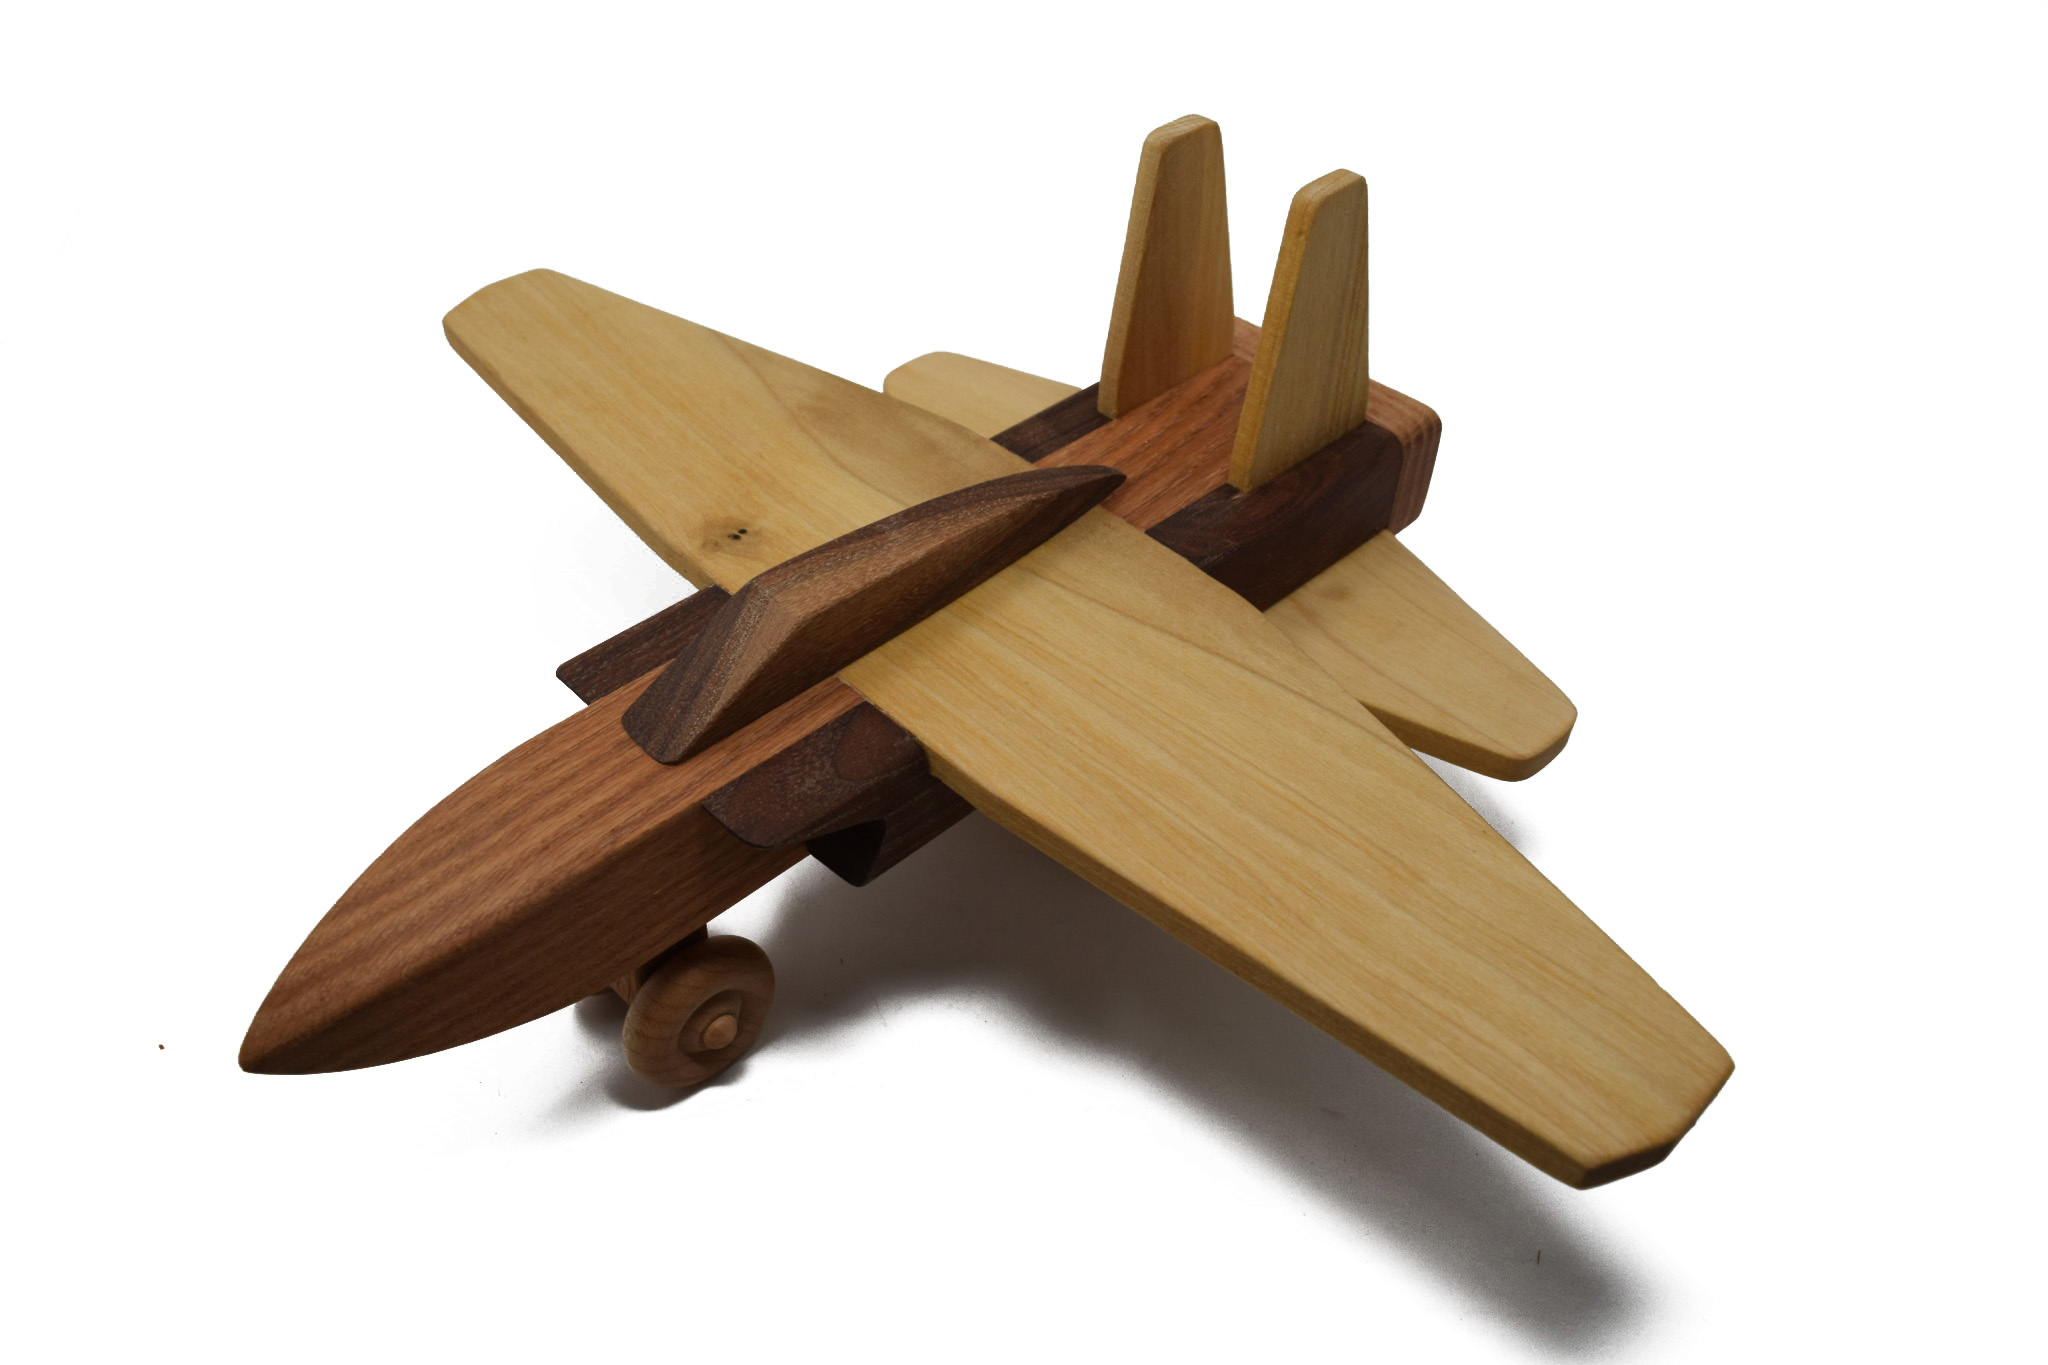 Wooden Jet Toy-1